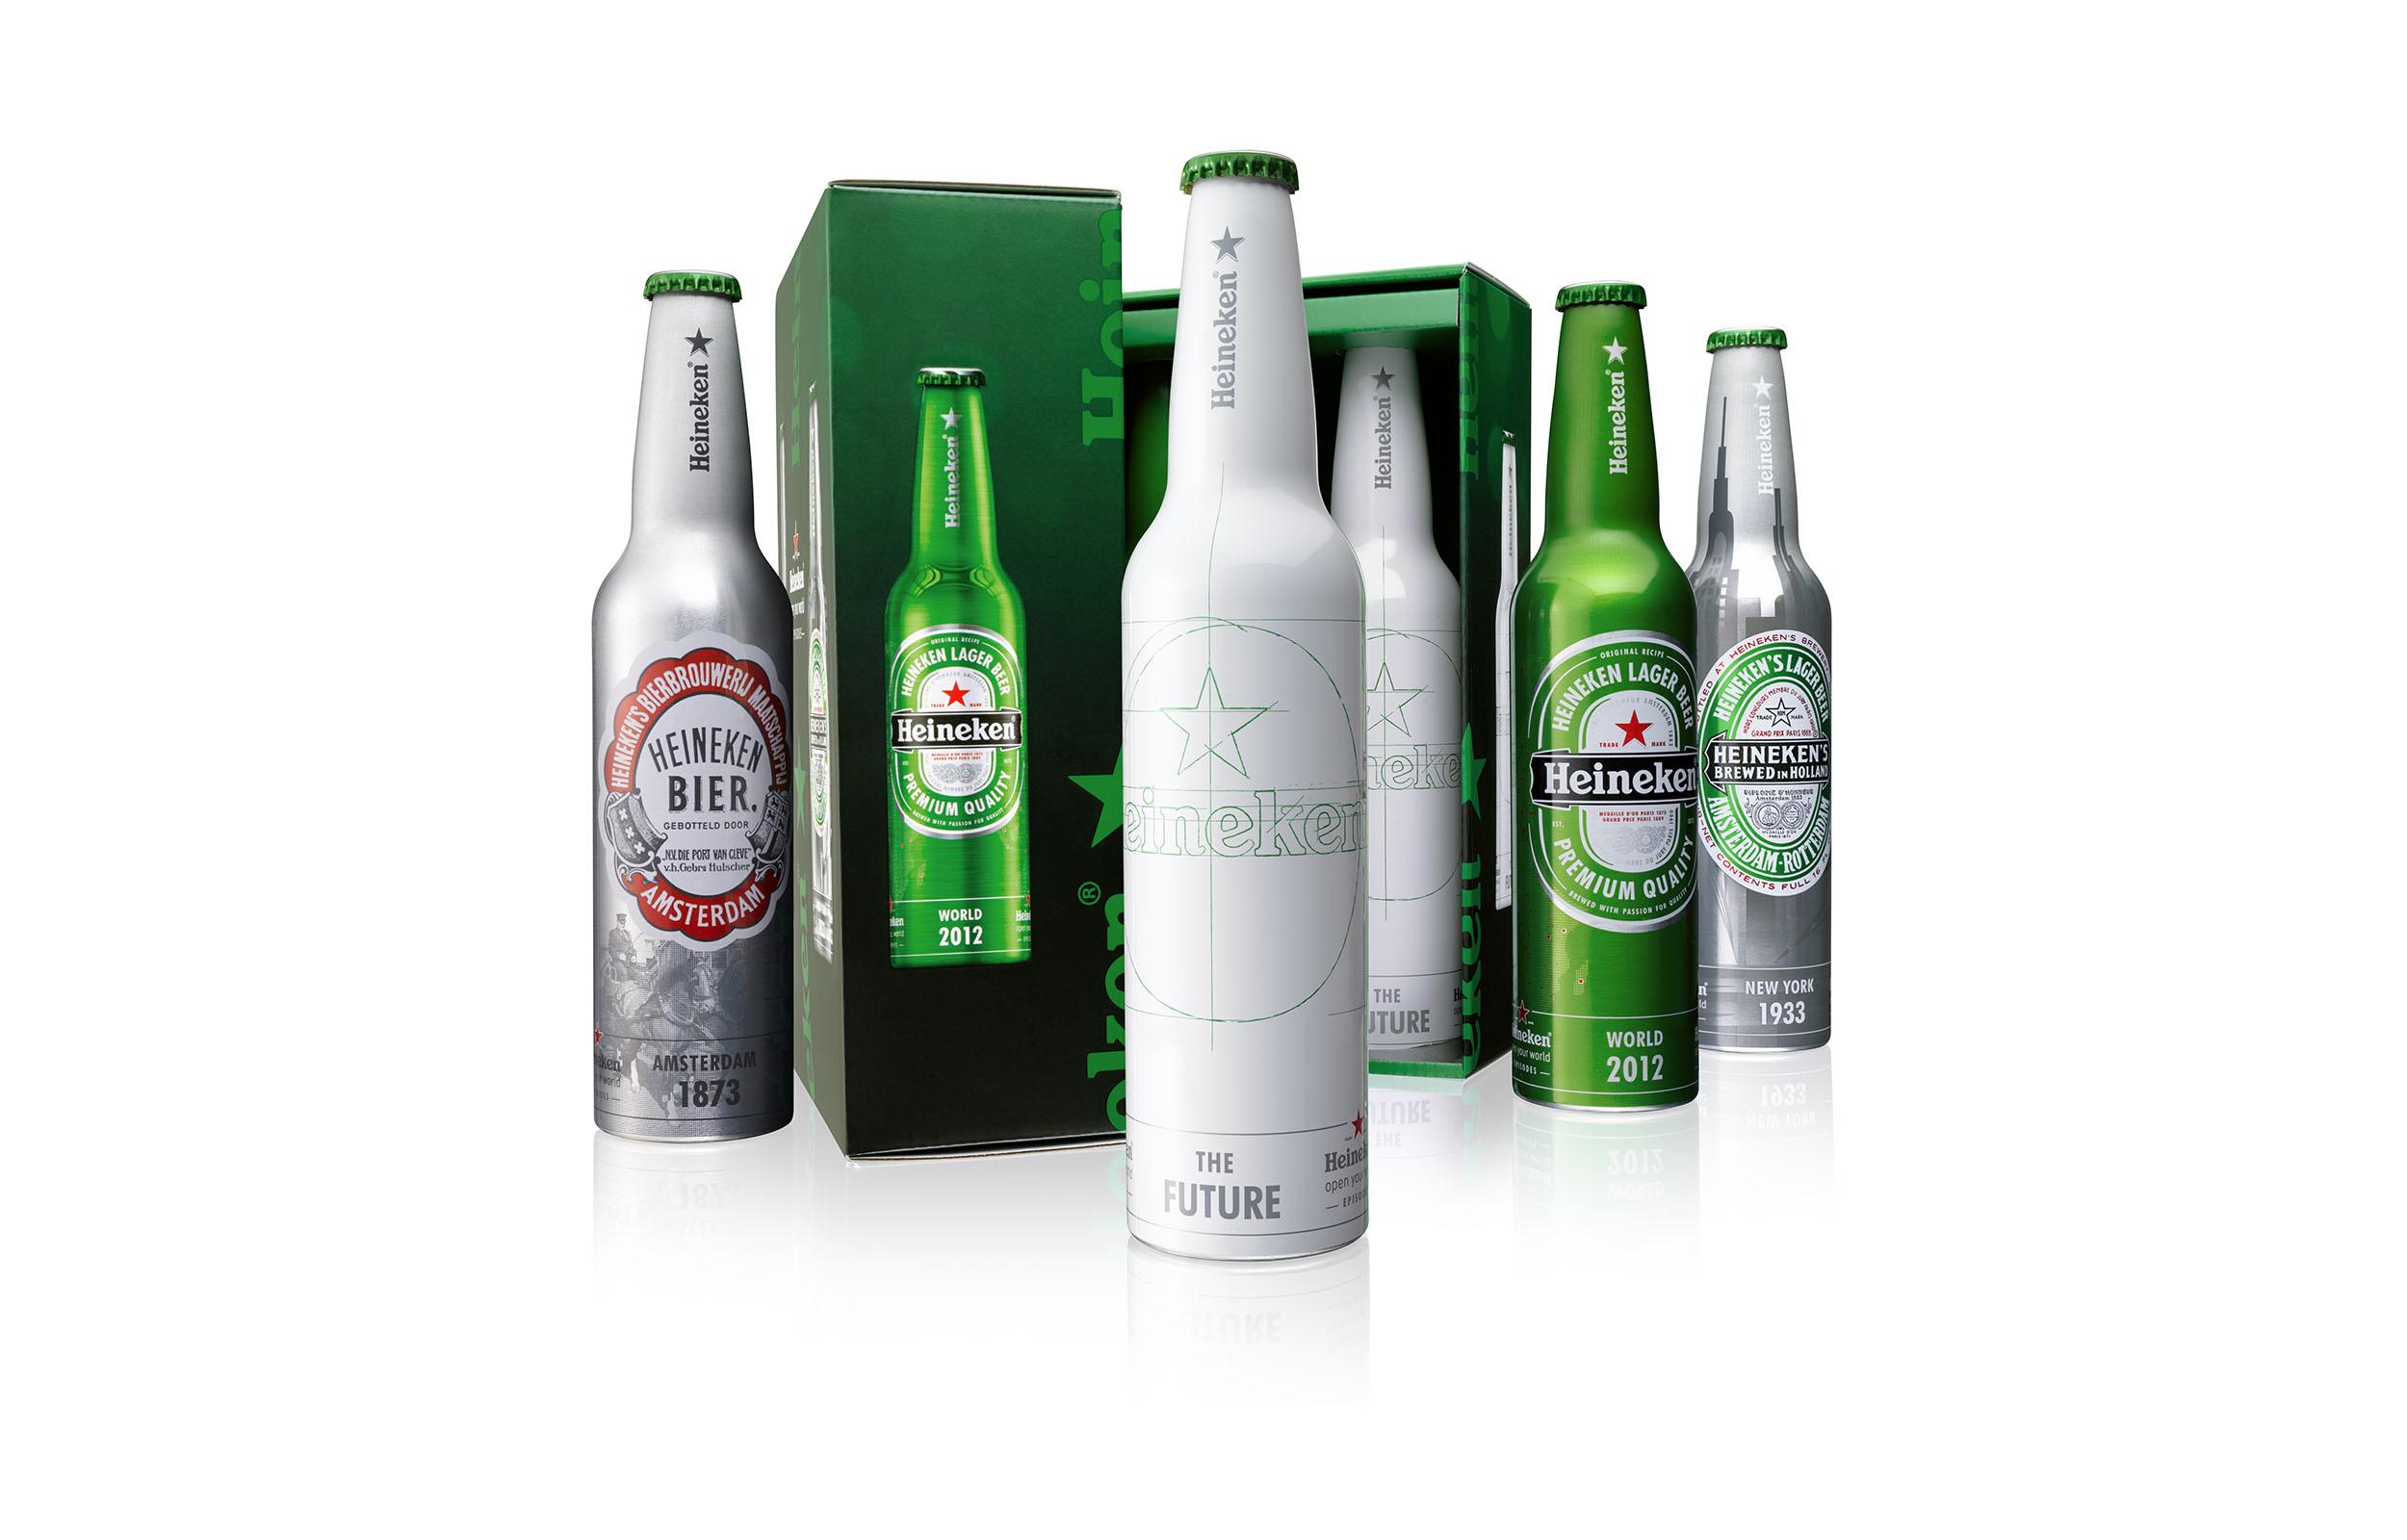 https://crisp.cc/wp-content/uploads/2015/04/Heineken-adv.jpg